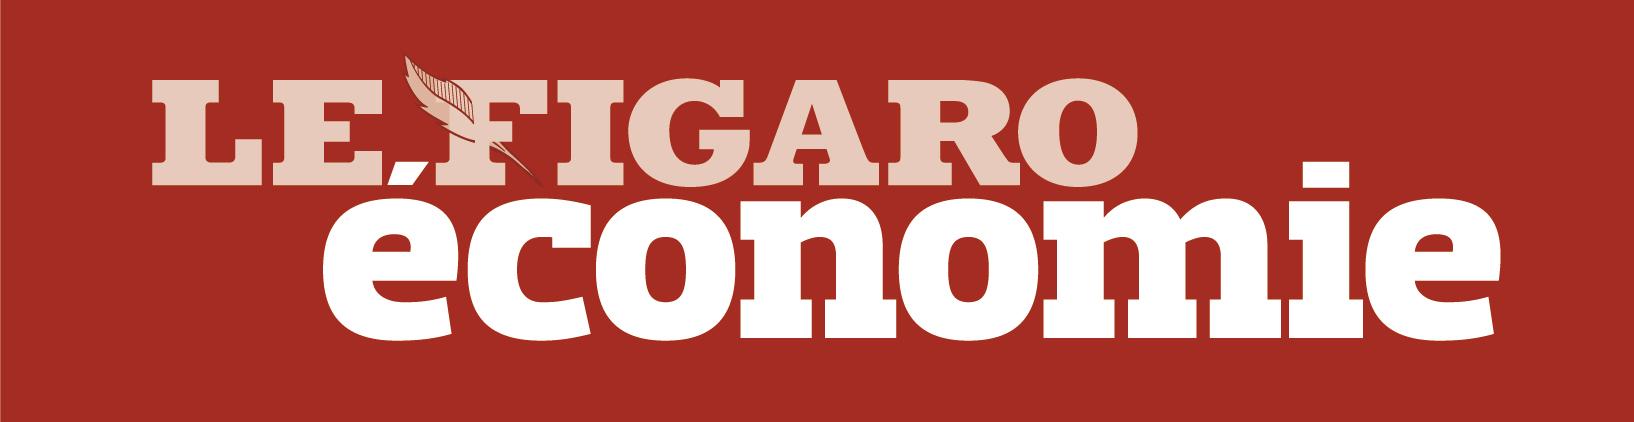 LOGO-FIGARO-ECO